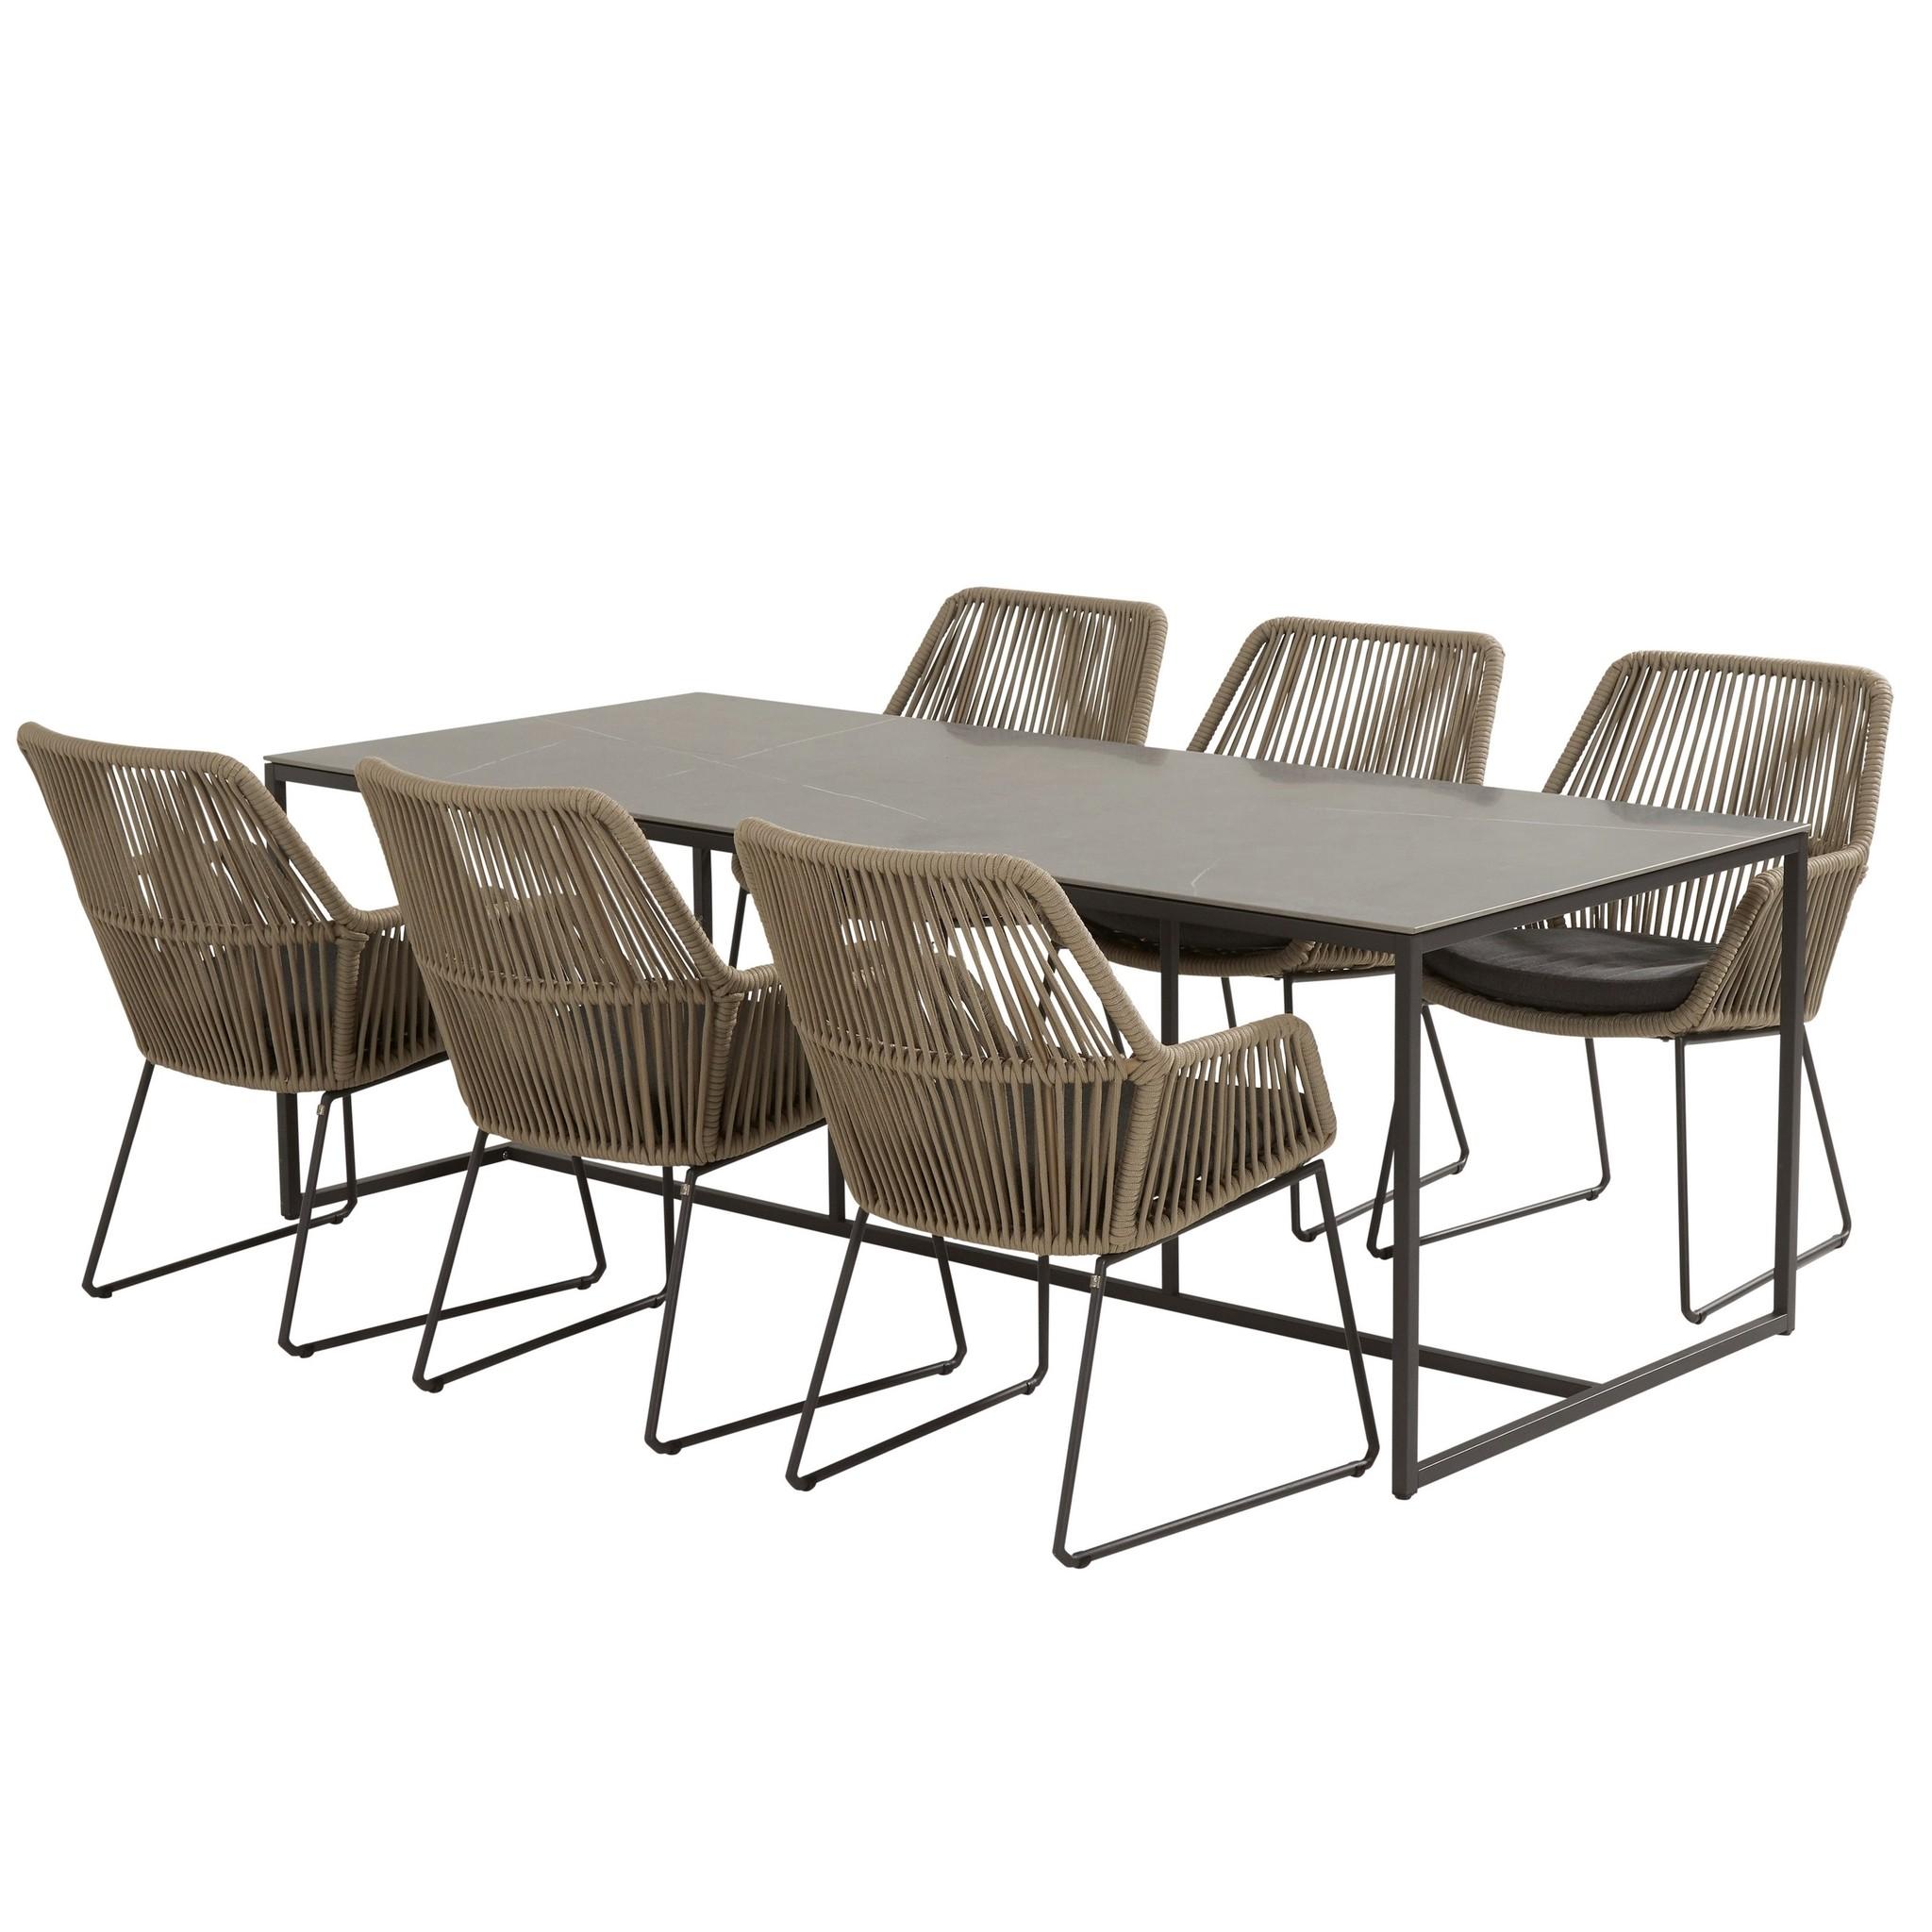 Ramblas Quatro dining tuinset 220x95xH76 cm 7-delig 4 Seasons Outdoor